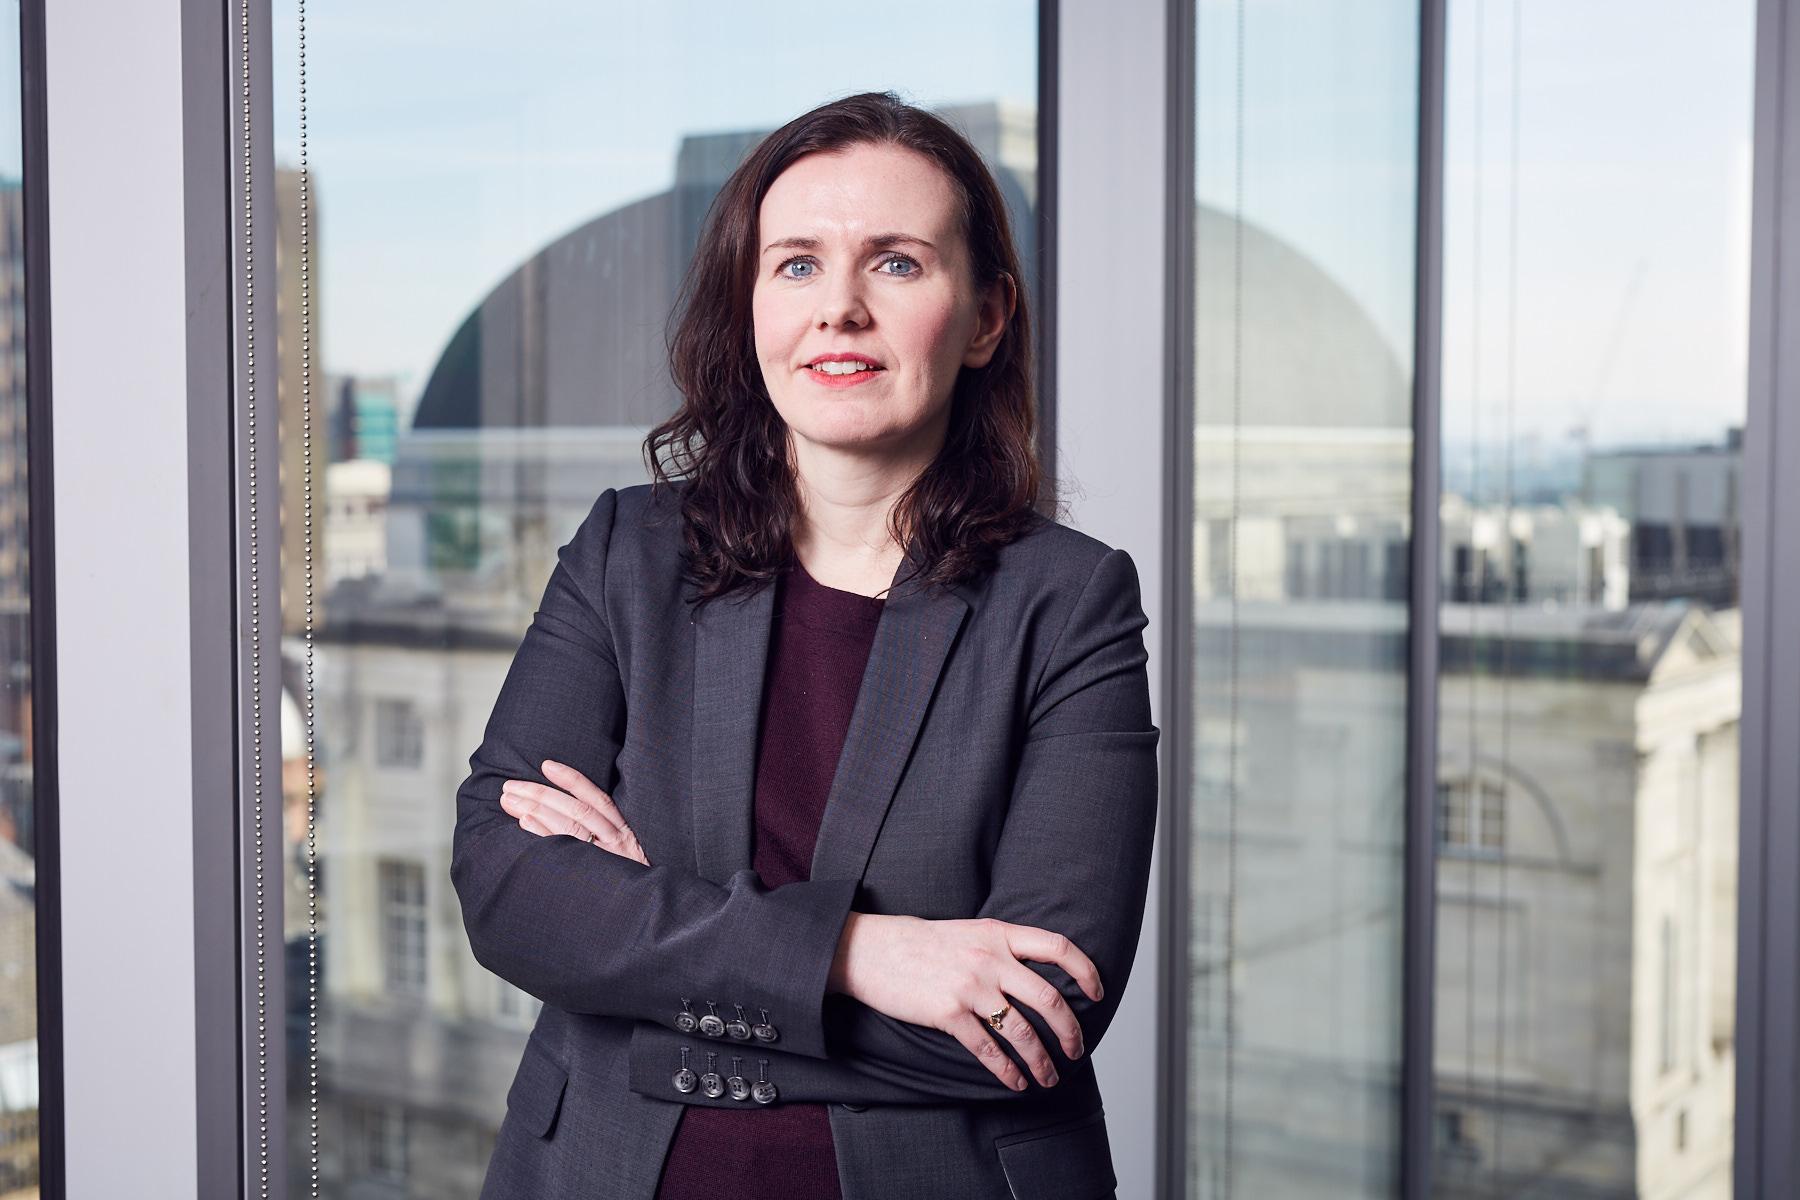 Portrait of Roisin Duffy